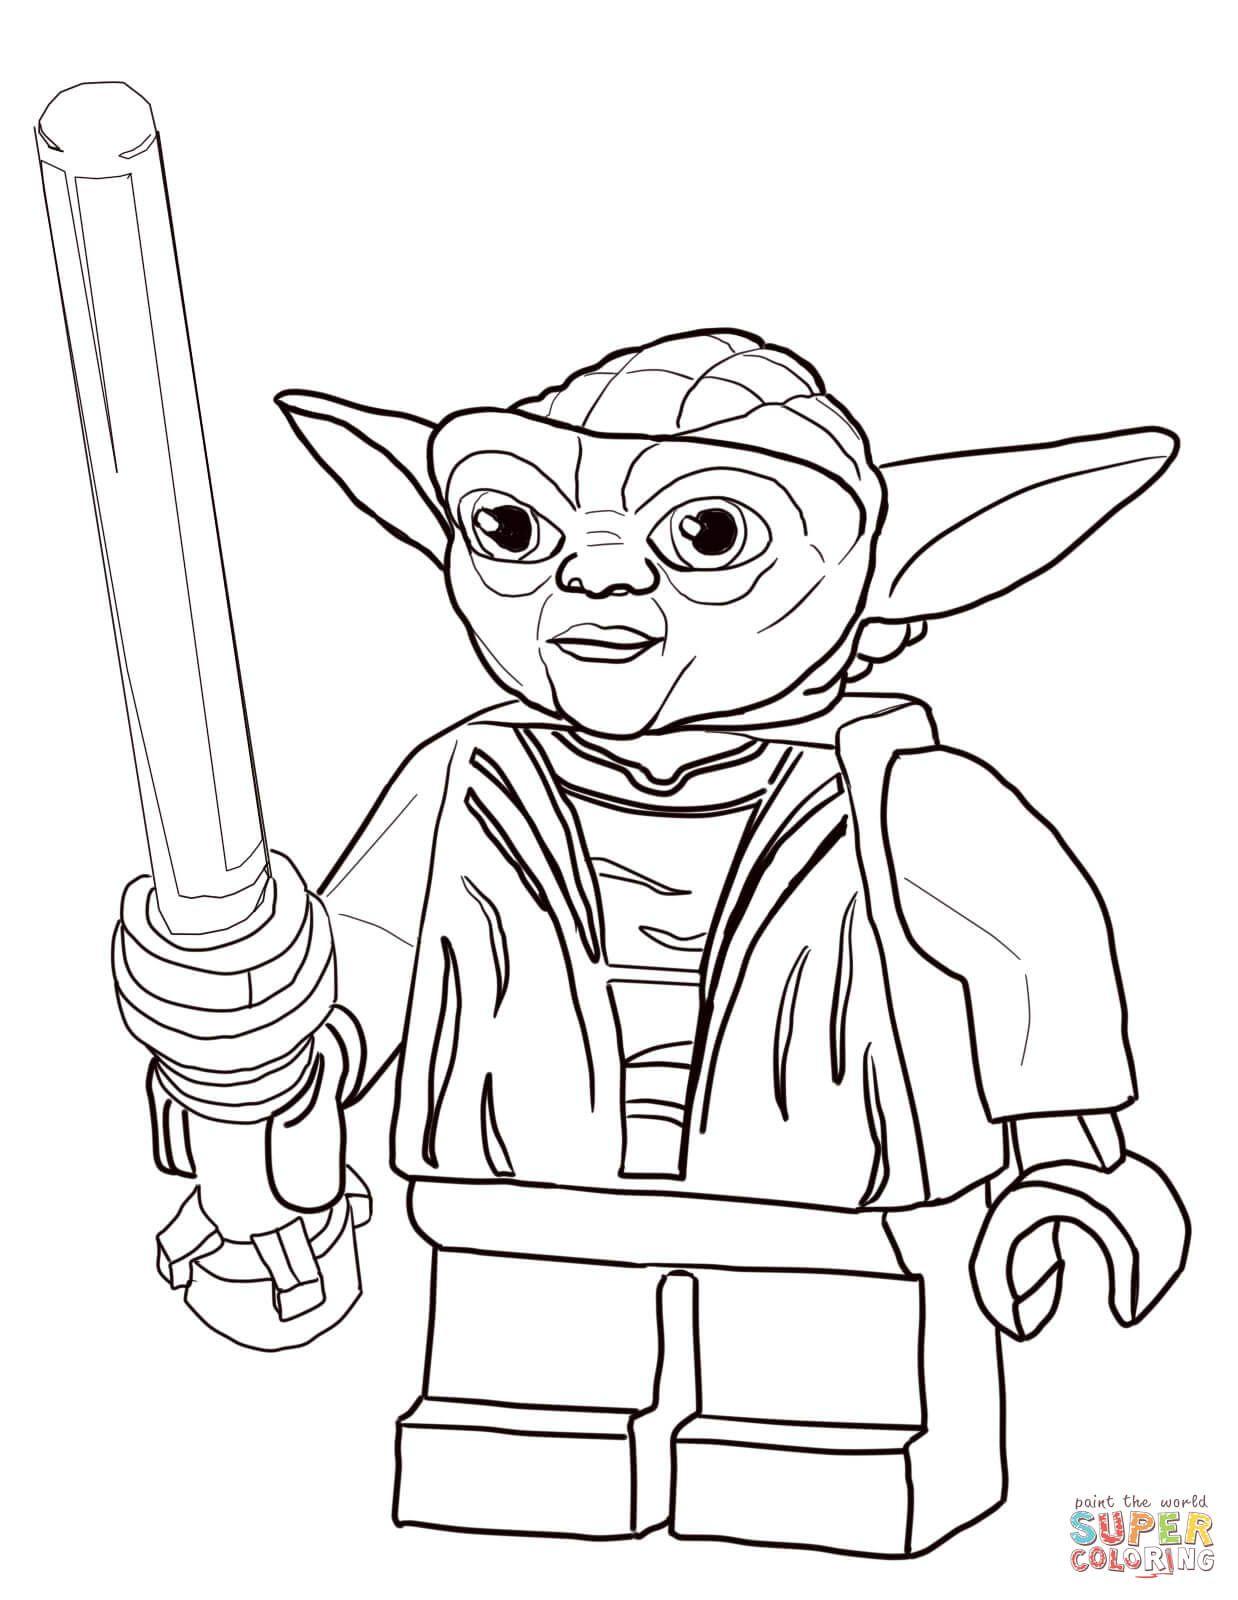 Lego Star Wars Master Yoda Super Coloring Lineart Star Wars